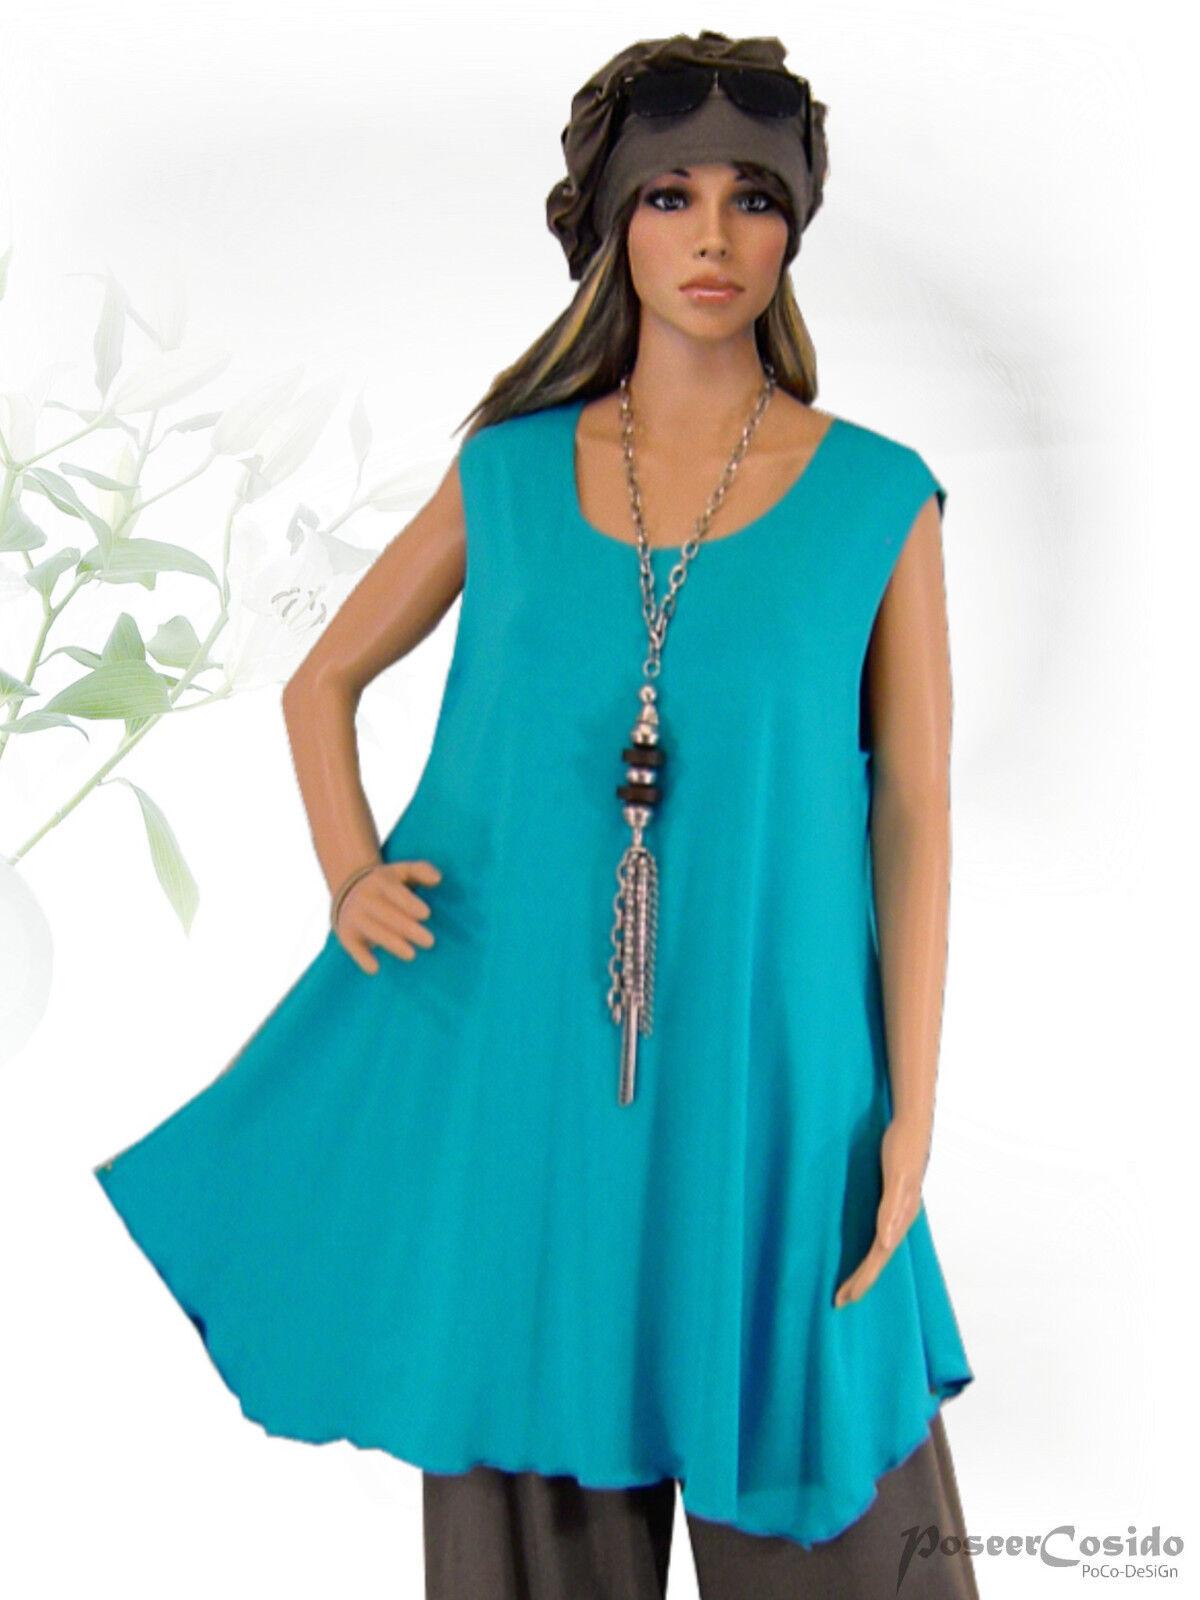 PoCo DeSiGn LAGENLOOK Top Long Shirt Jersey Tunika 42-58  L-XL-XXL-XXXL türkis